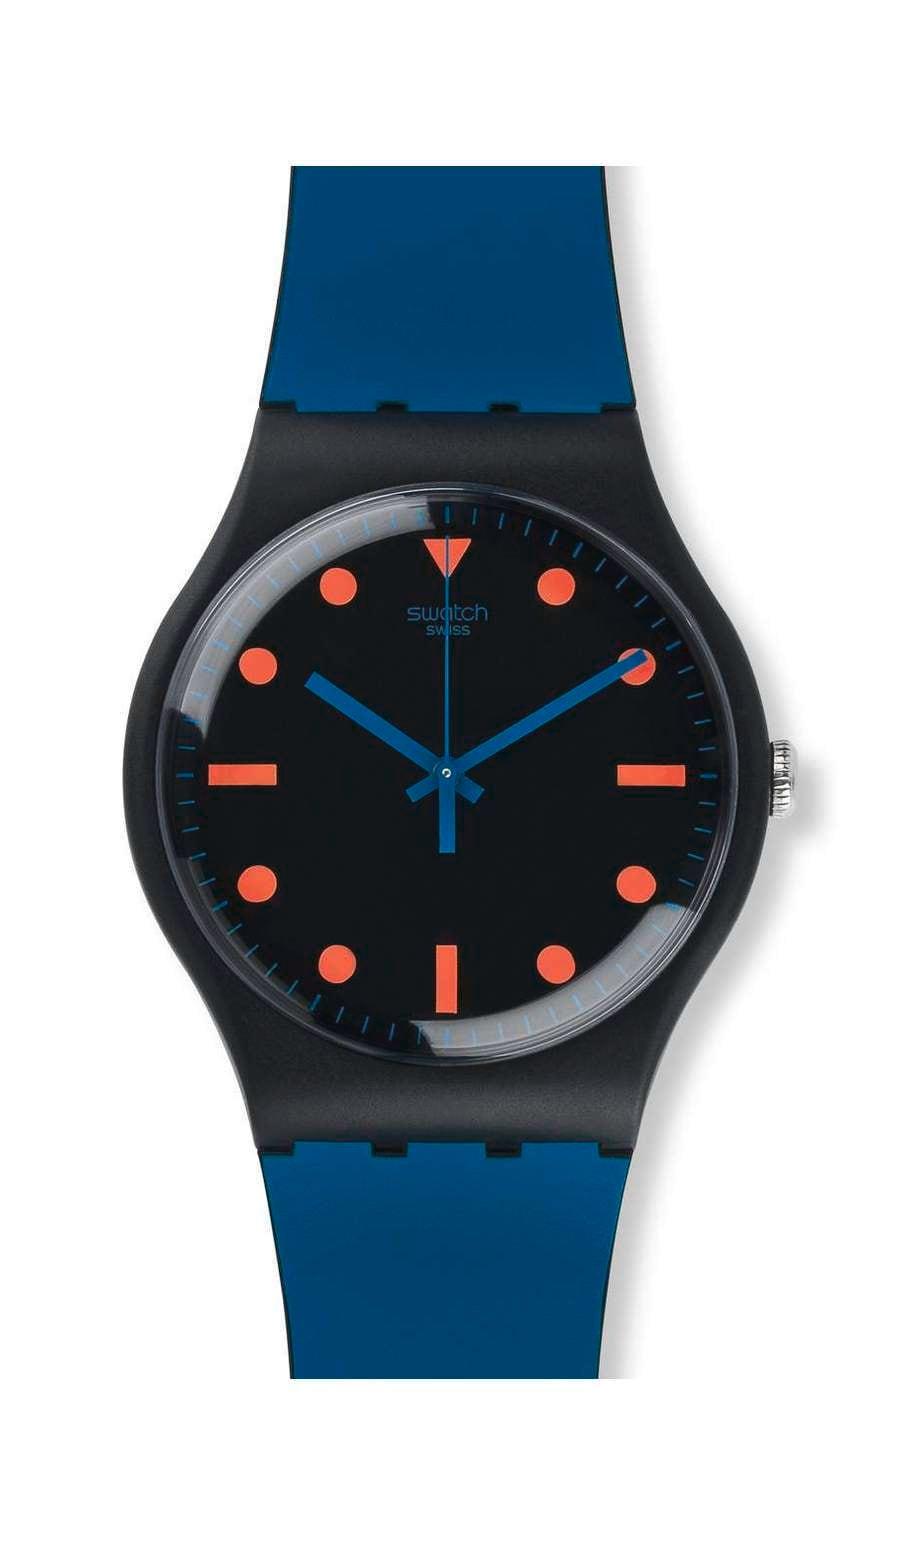 Swatch - NON SLIP - 1